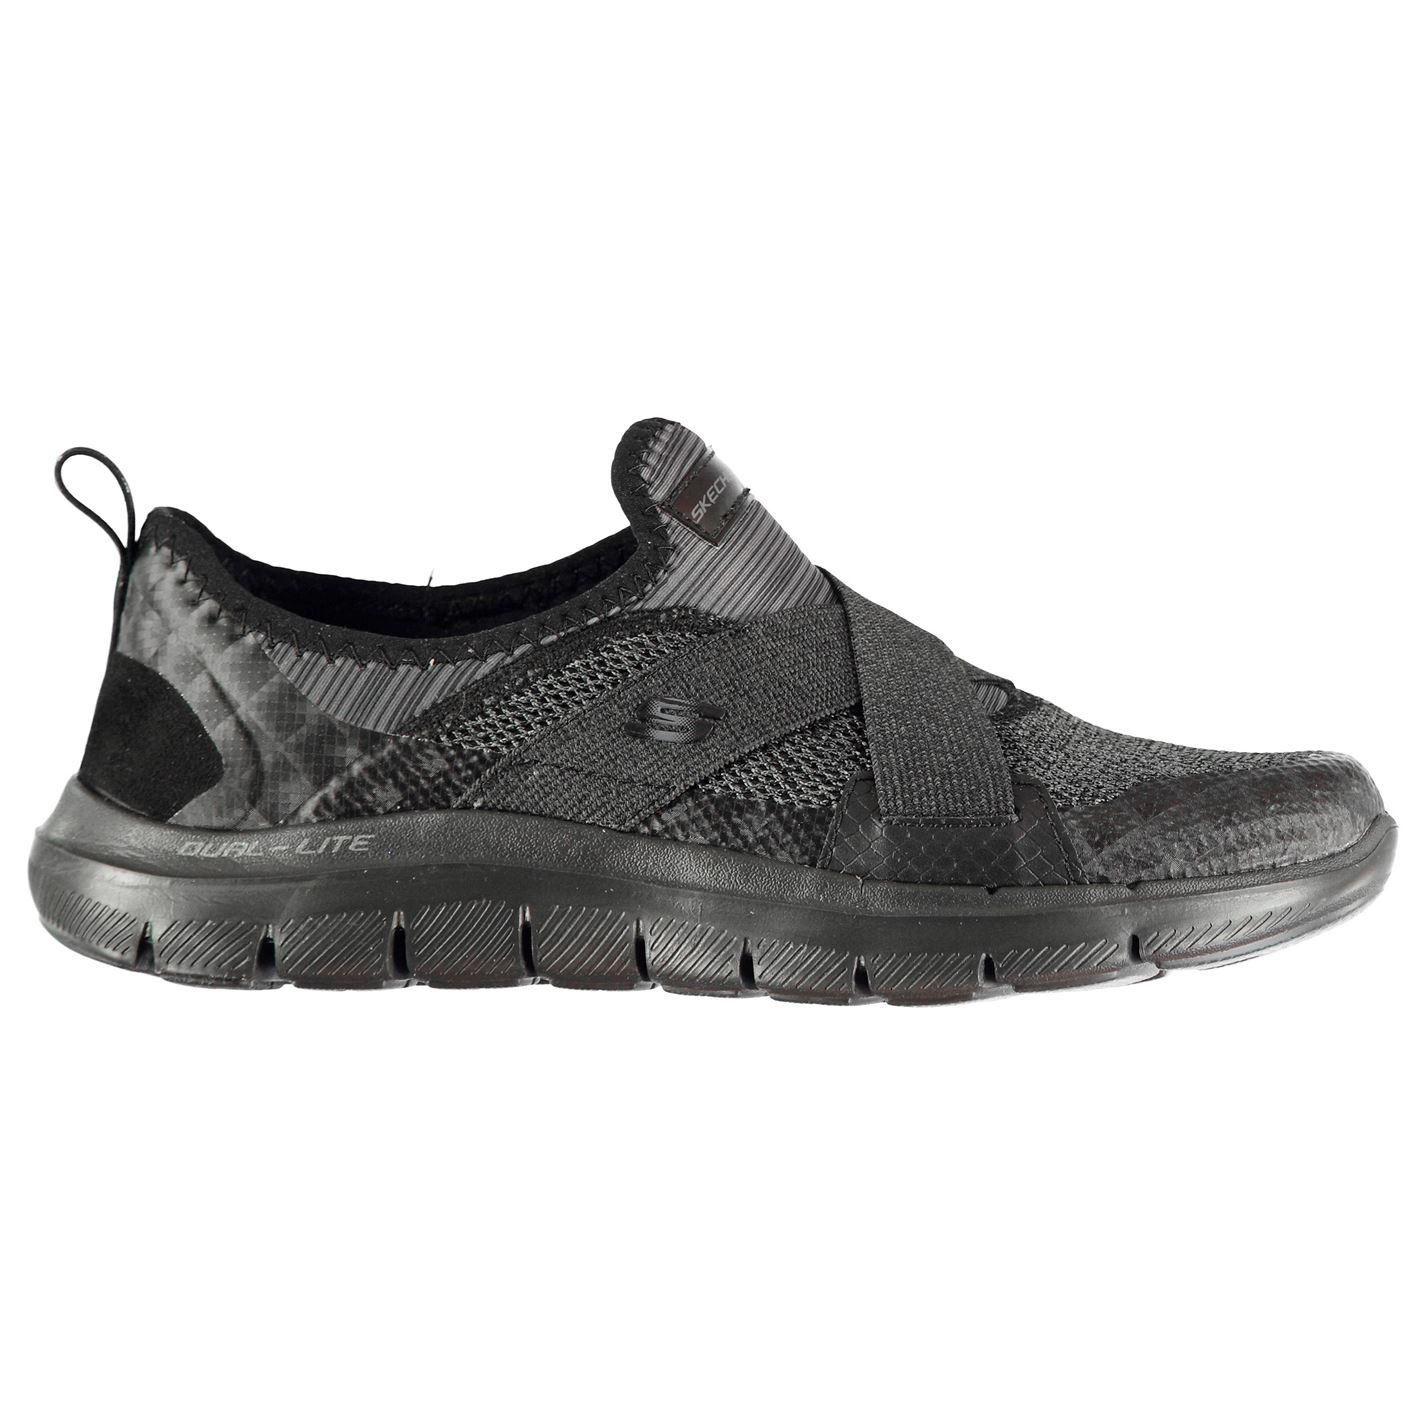 Skechers Flex Appeal 2.0 New Image Shoes Ladies